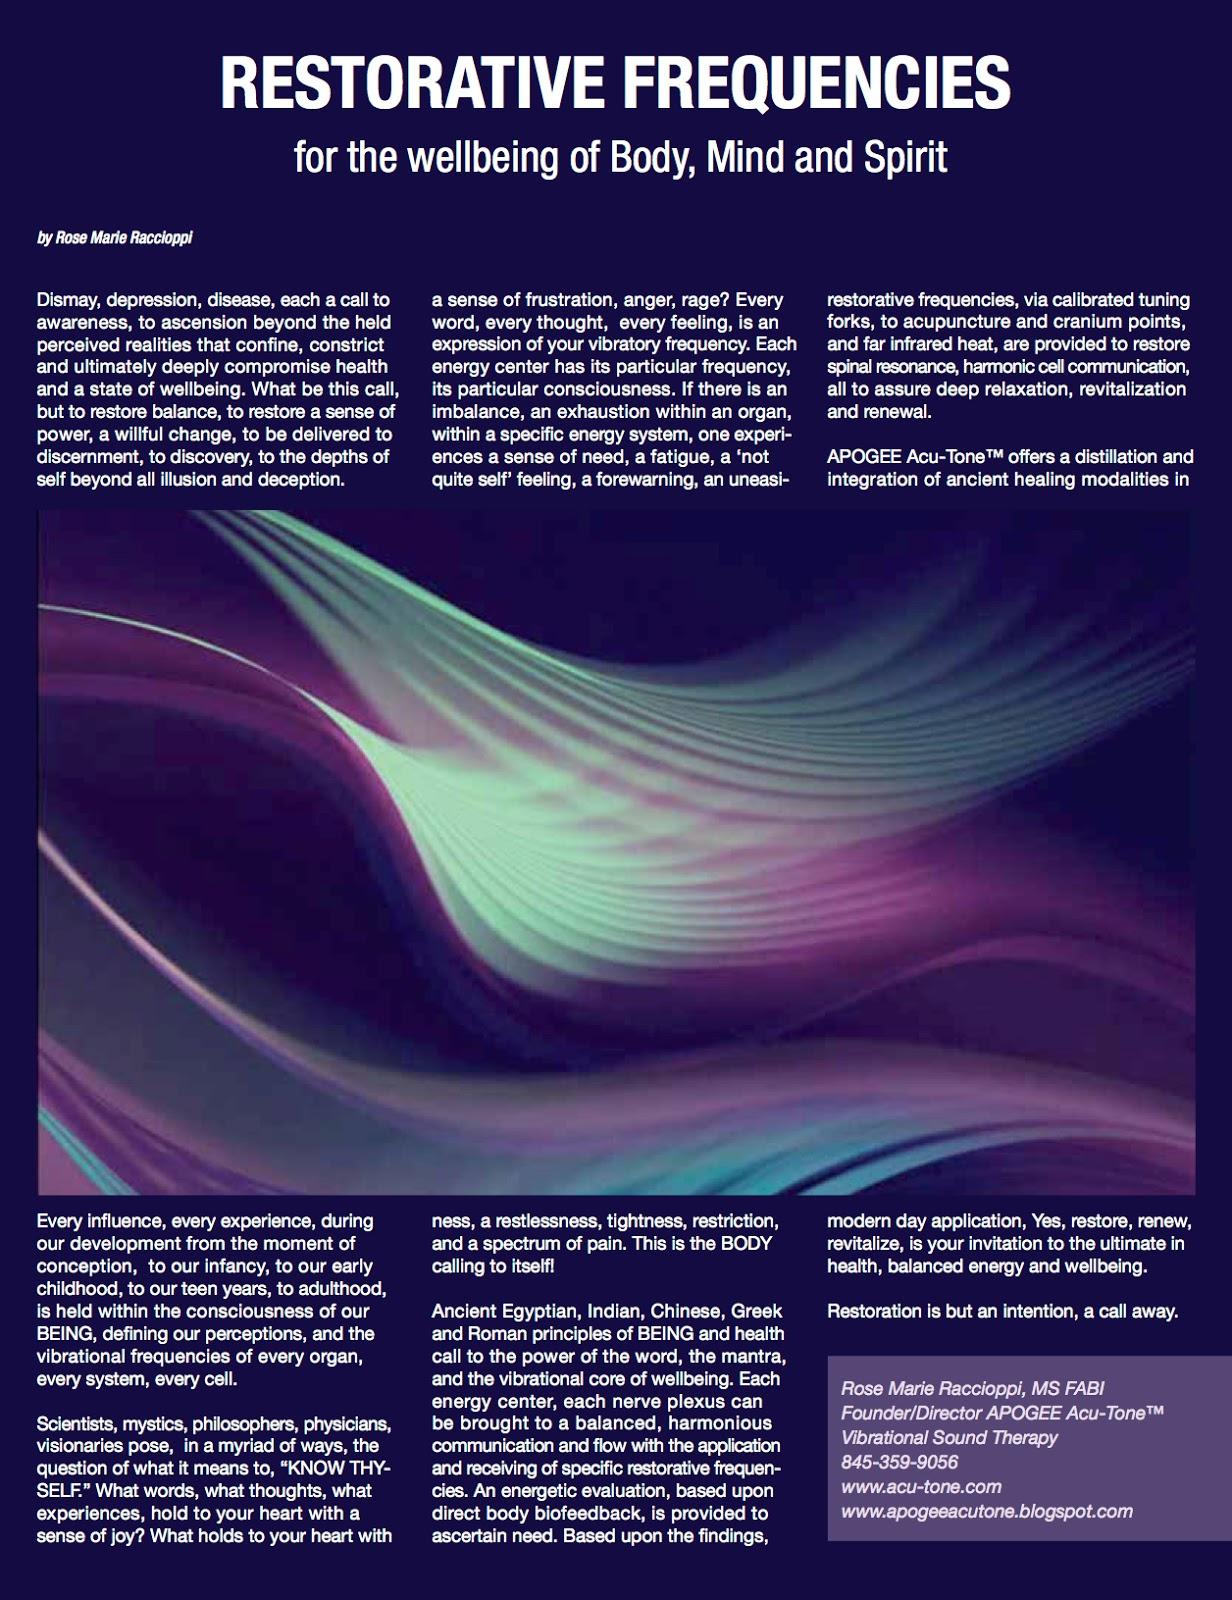 APOGEE Acu-Tone™ ~ Vibrational Sound Therapy: RESTORATIVE